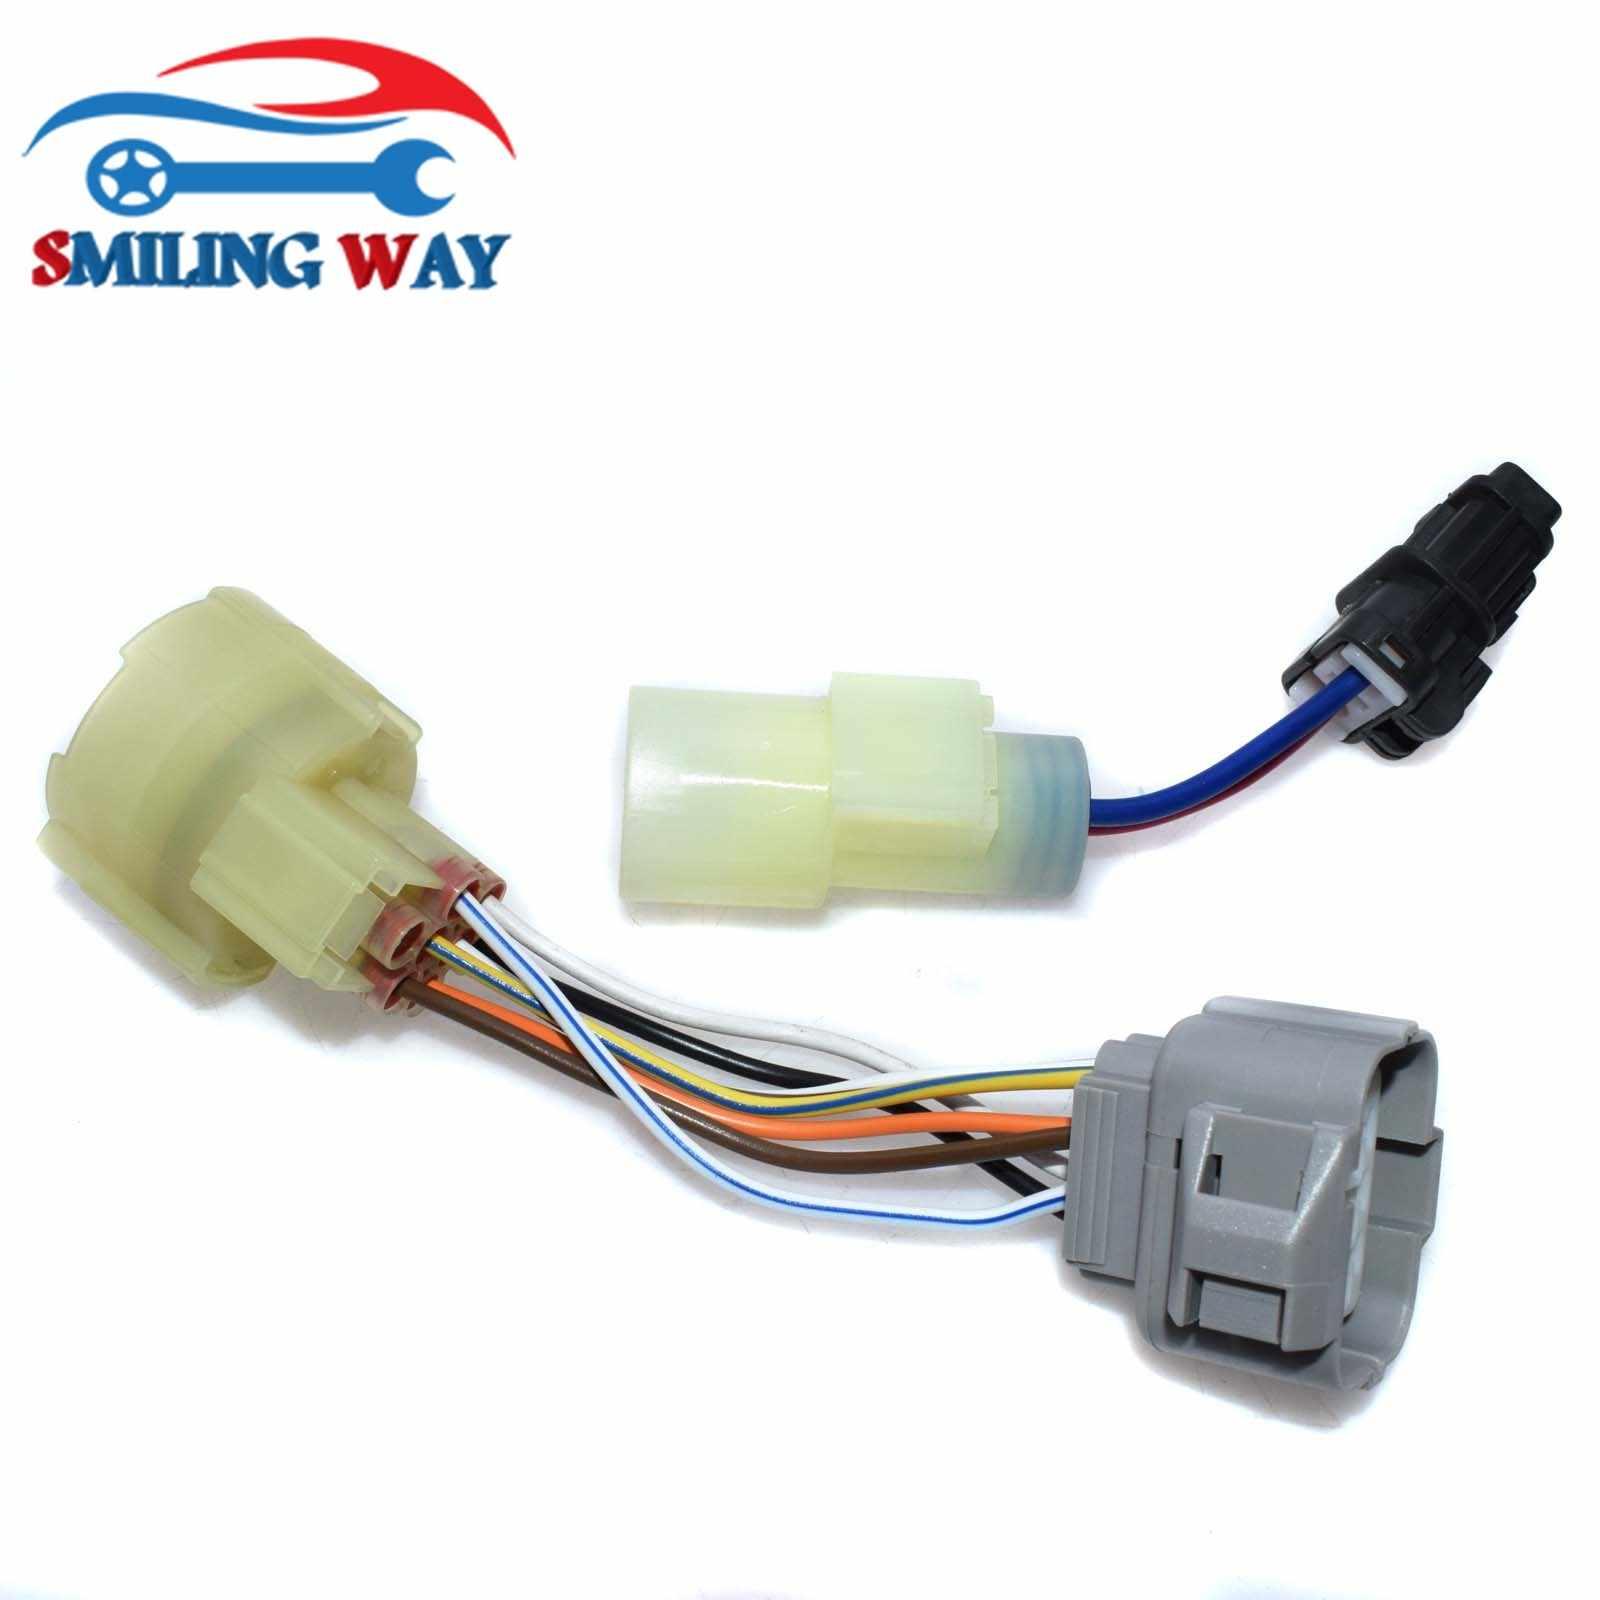 small resolution of  obd0 to obd1 ecu distributor adaptor connector wire harness cable for honda crx civic prelude acura